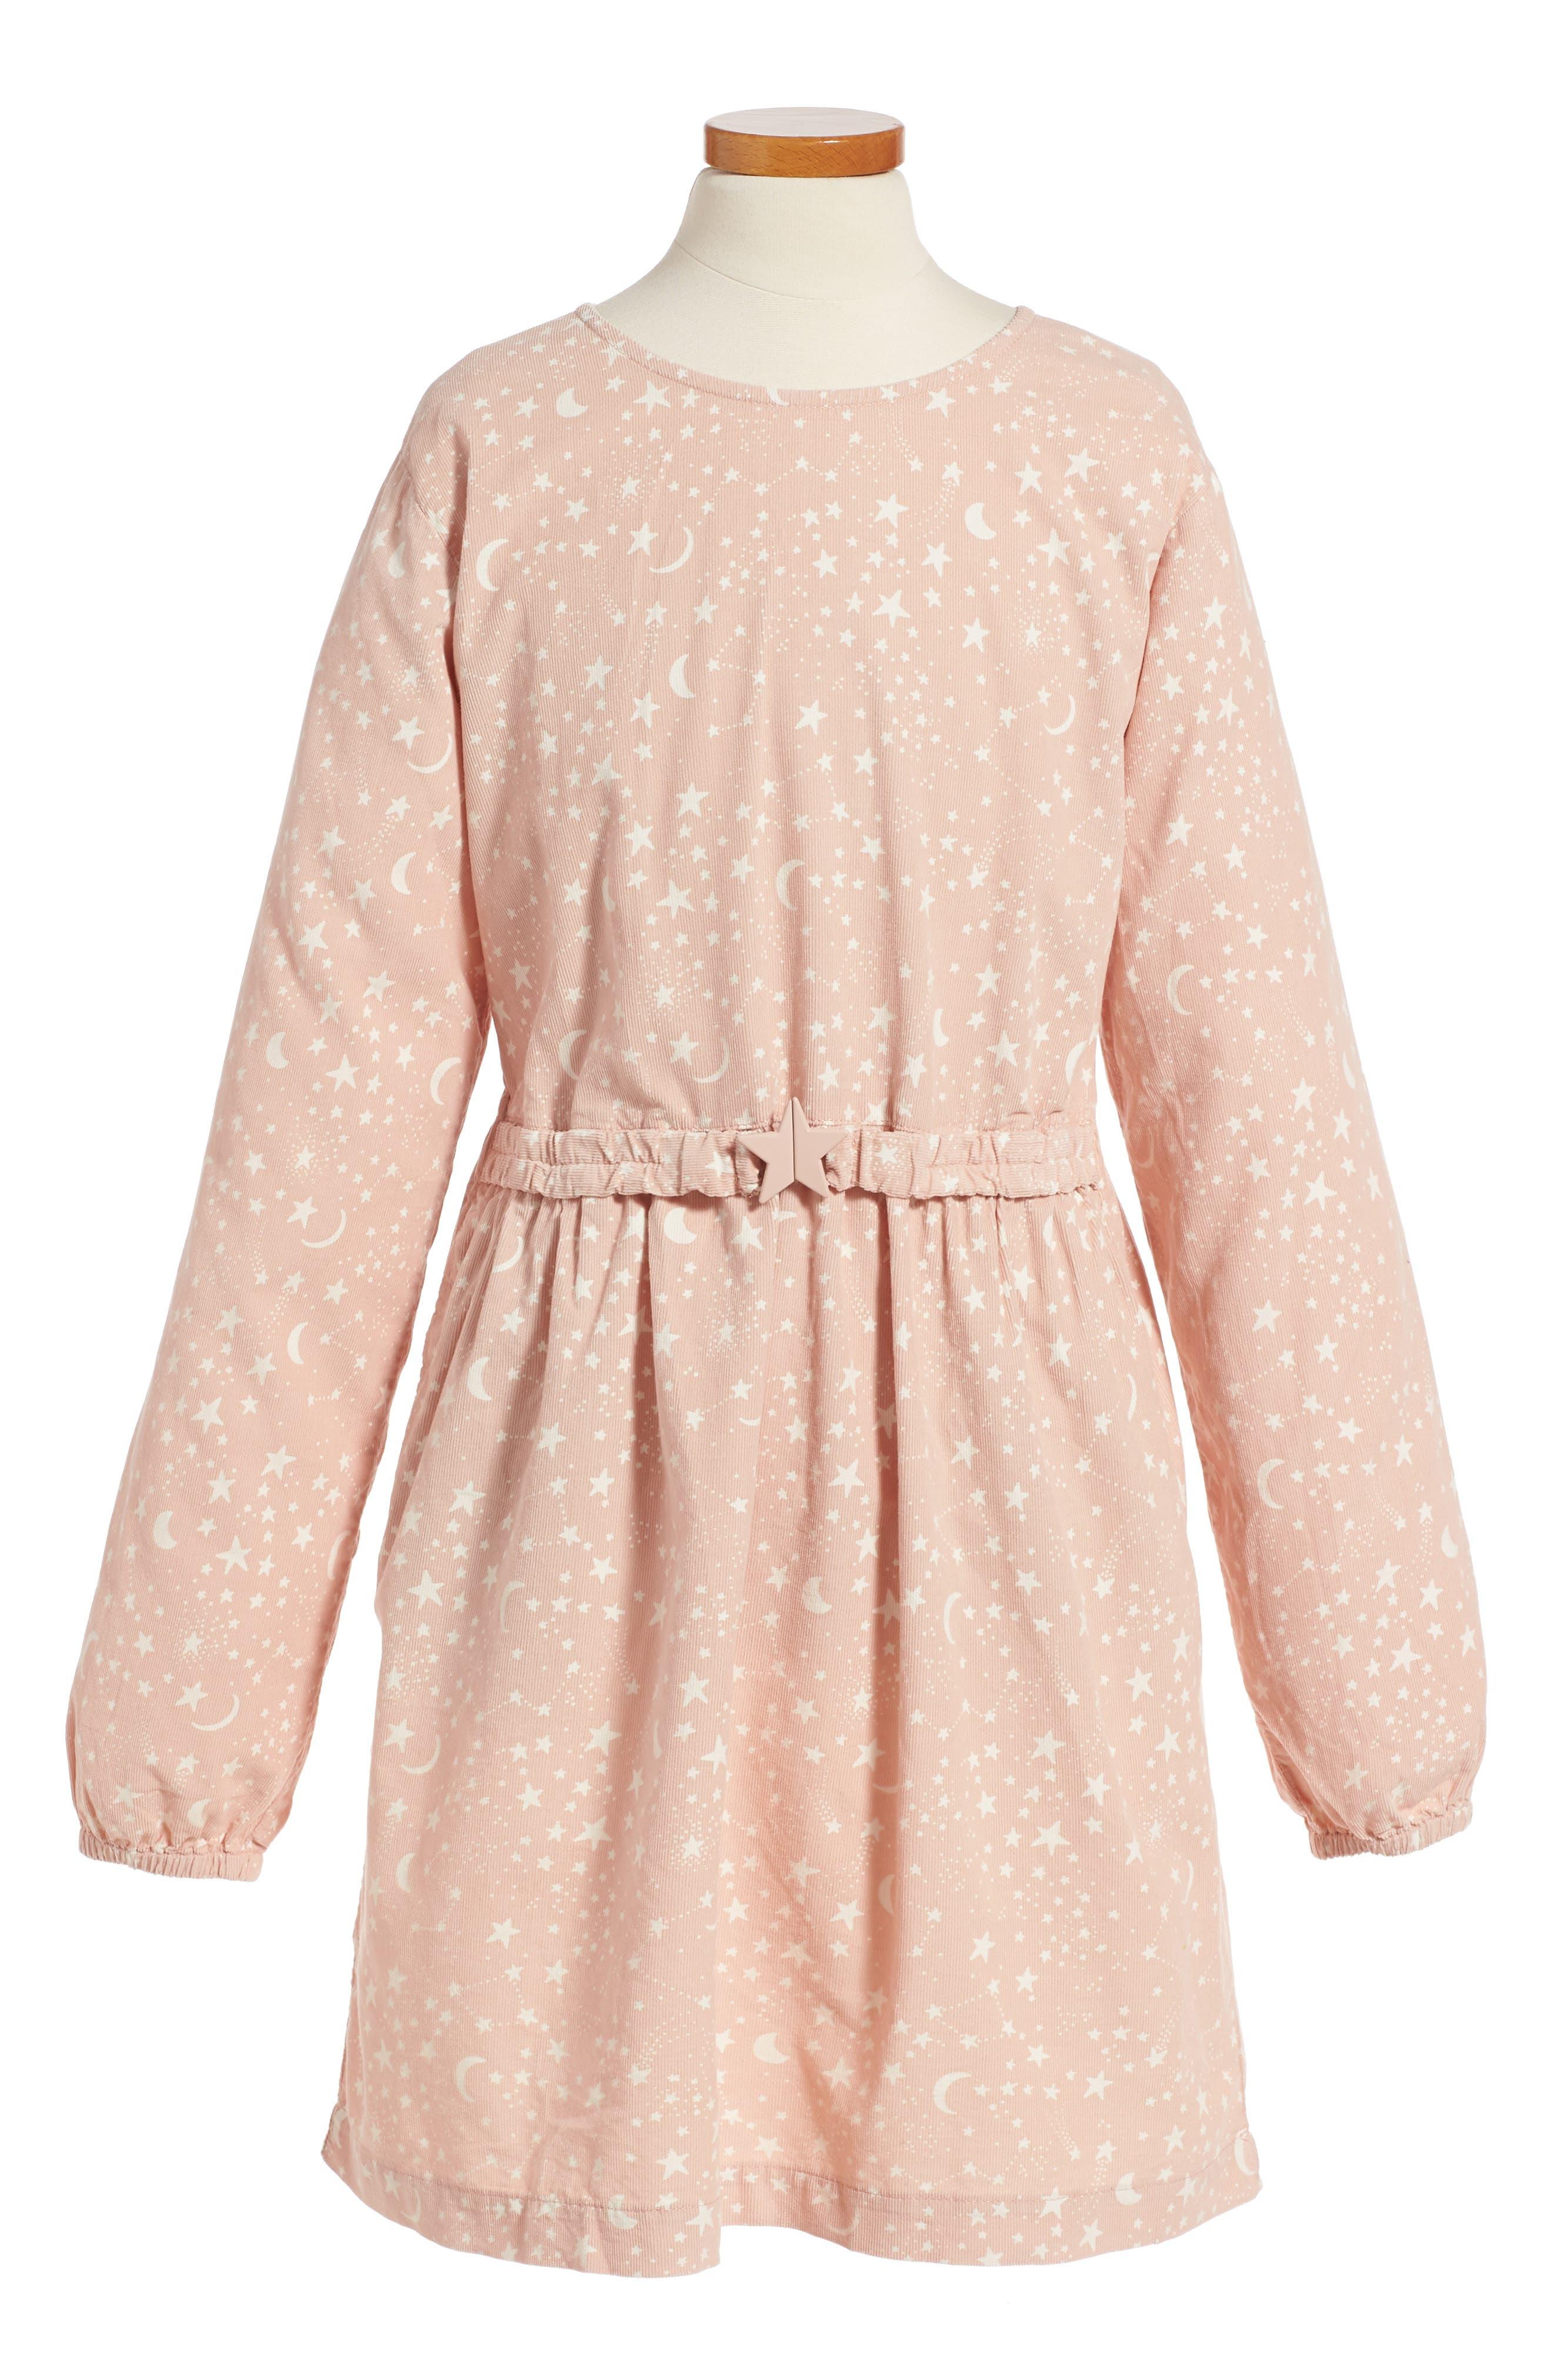 Kids Skippy Star Print Dress,                             Main thumbnail 1, color,                             650